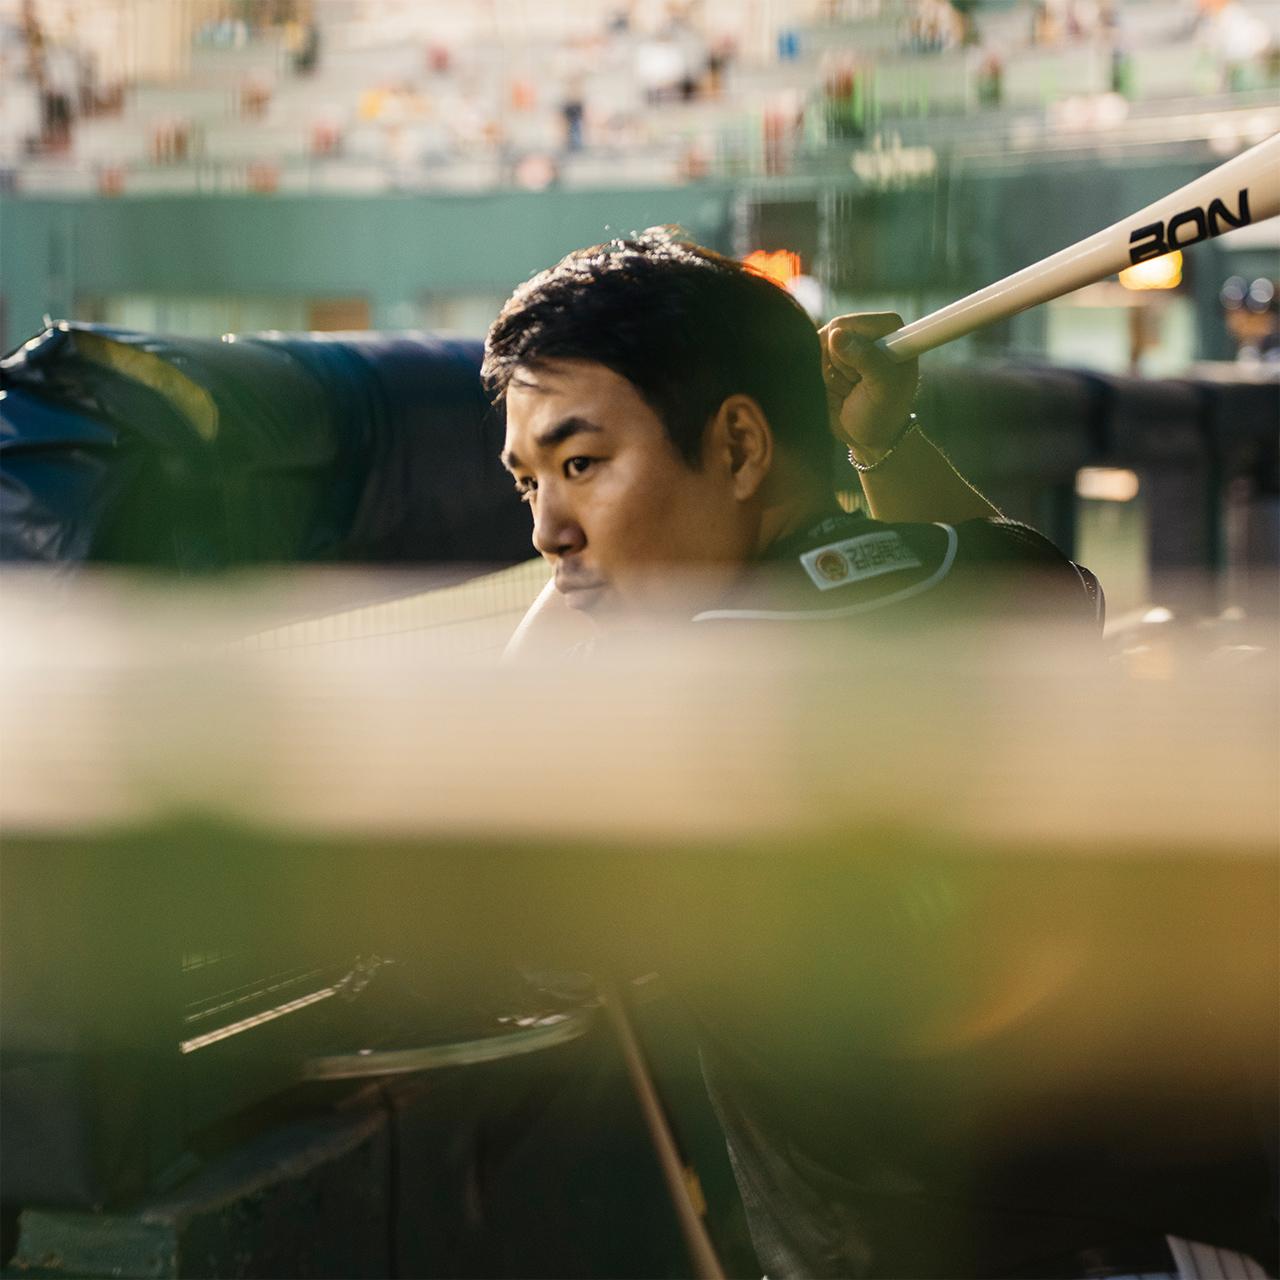 "<strong>장동웅(25번, 1988년생), 포수</strong><br/>""여기 온 이상은... 되든 안 되든 후회 없이 해보고 싶어요."""